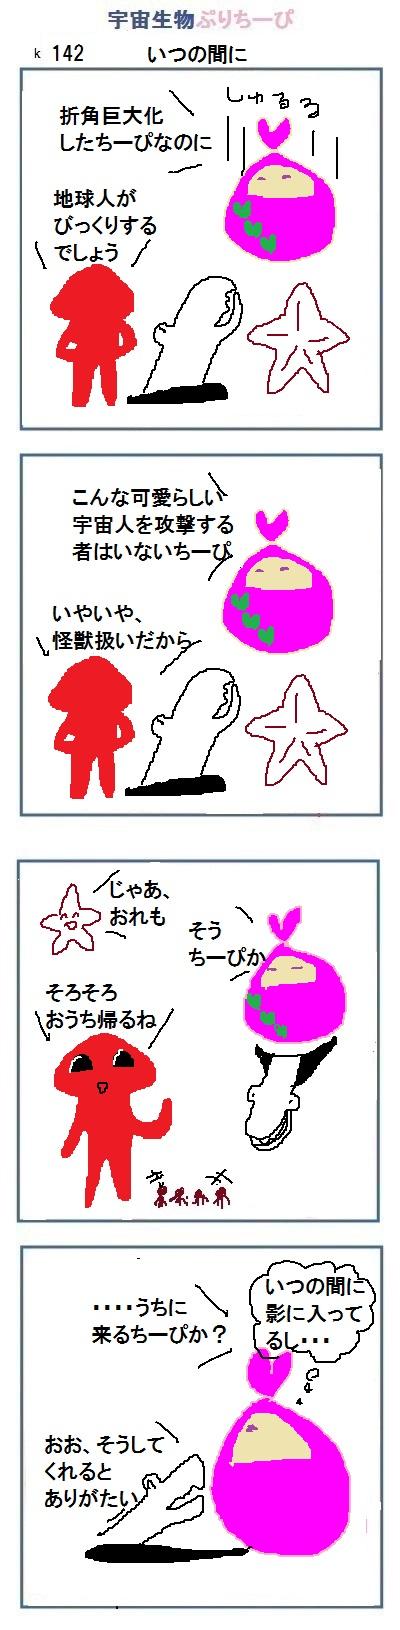 161025_k142